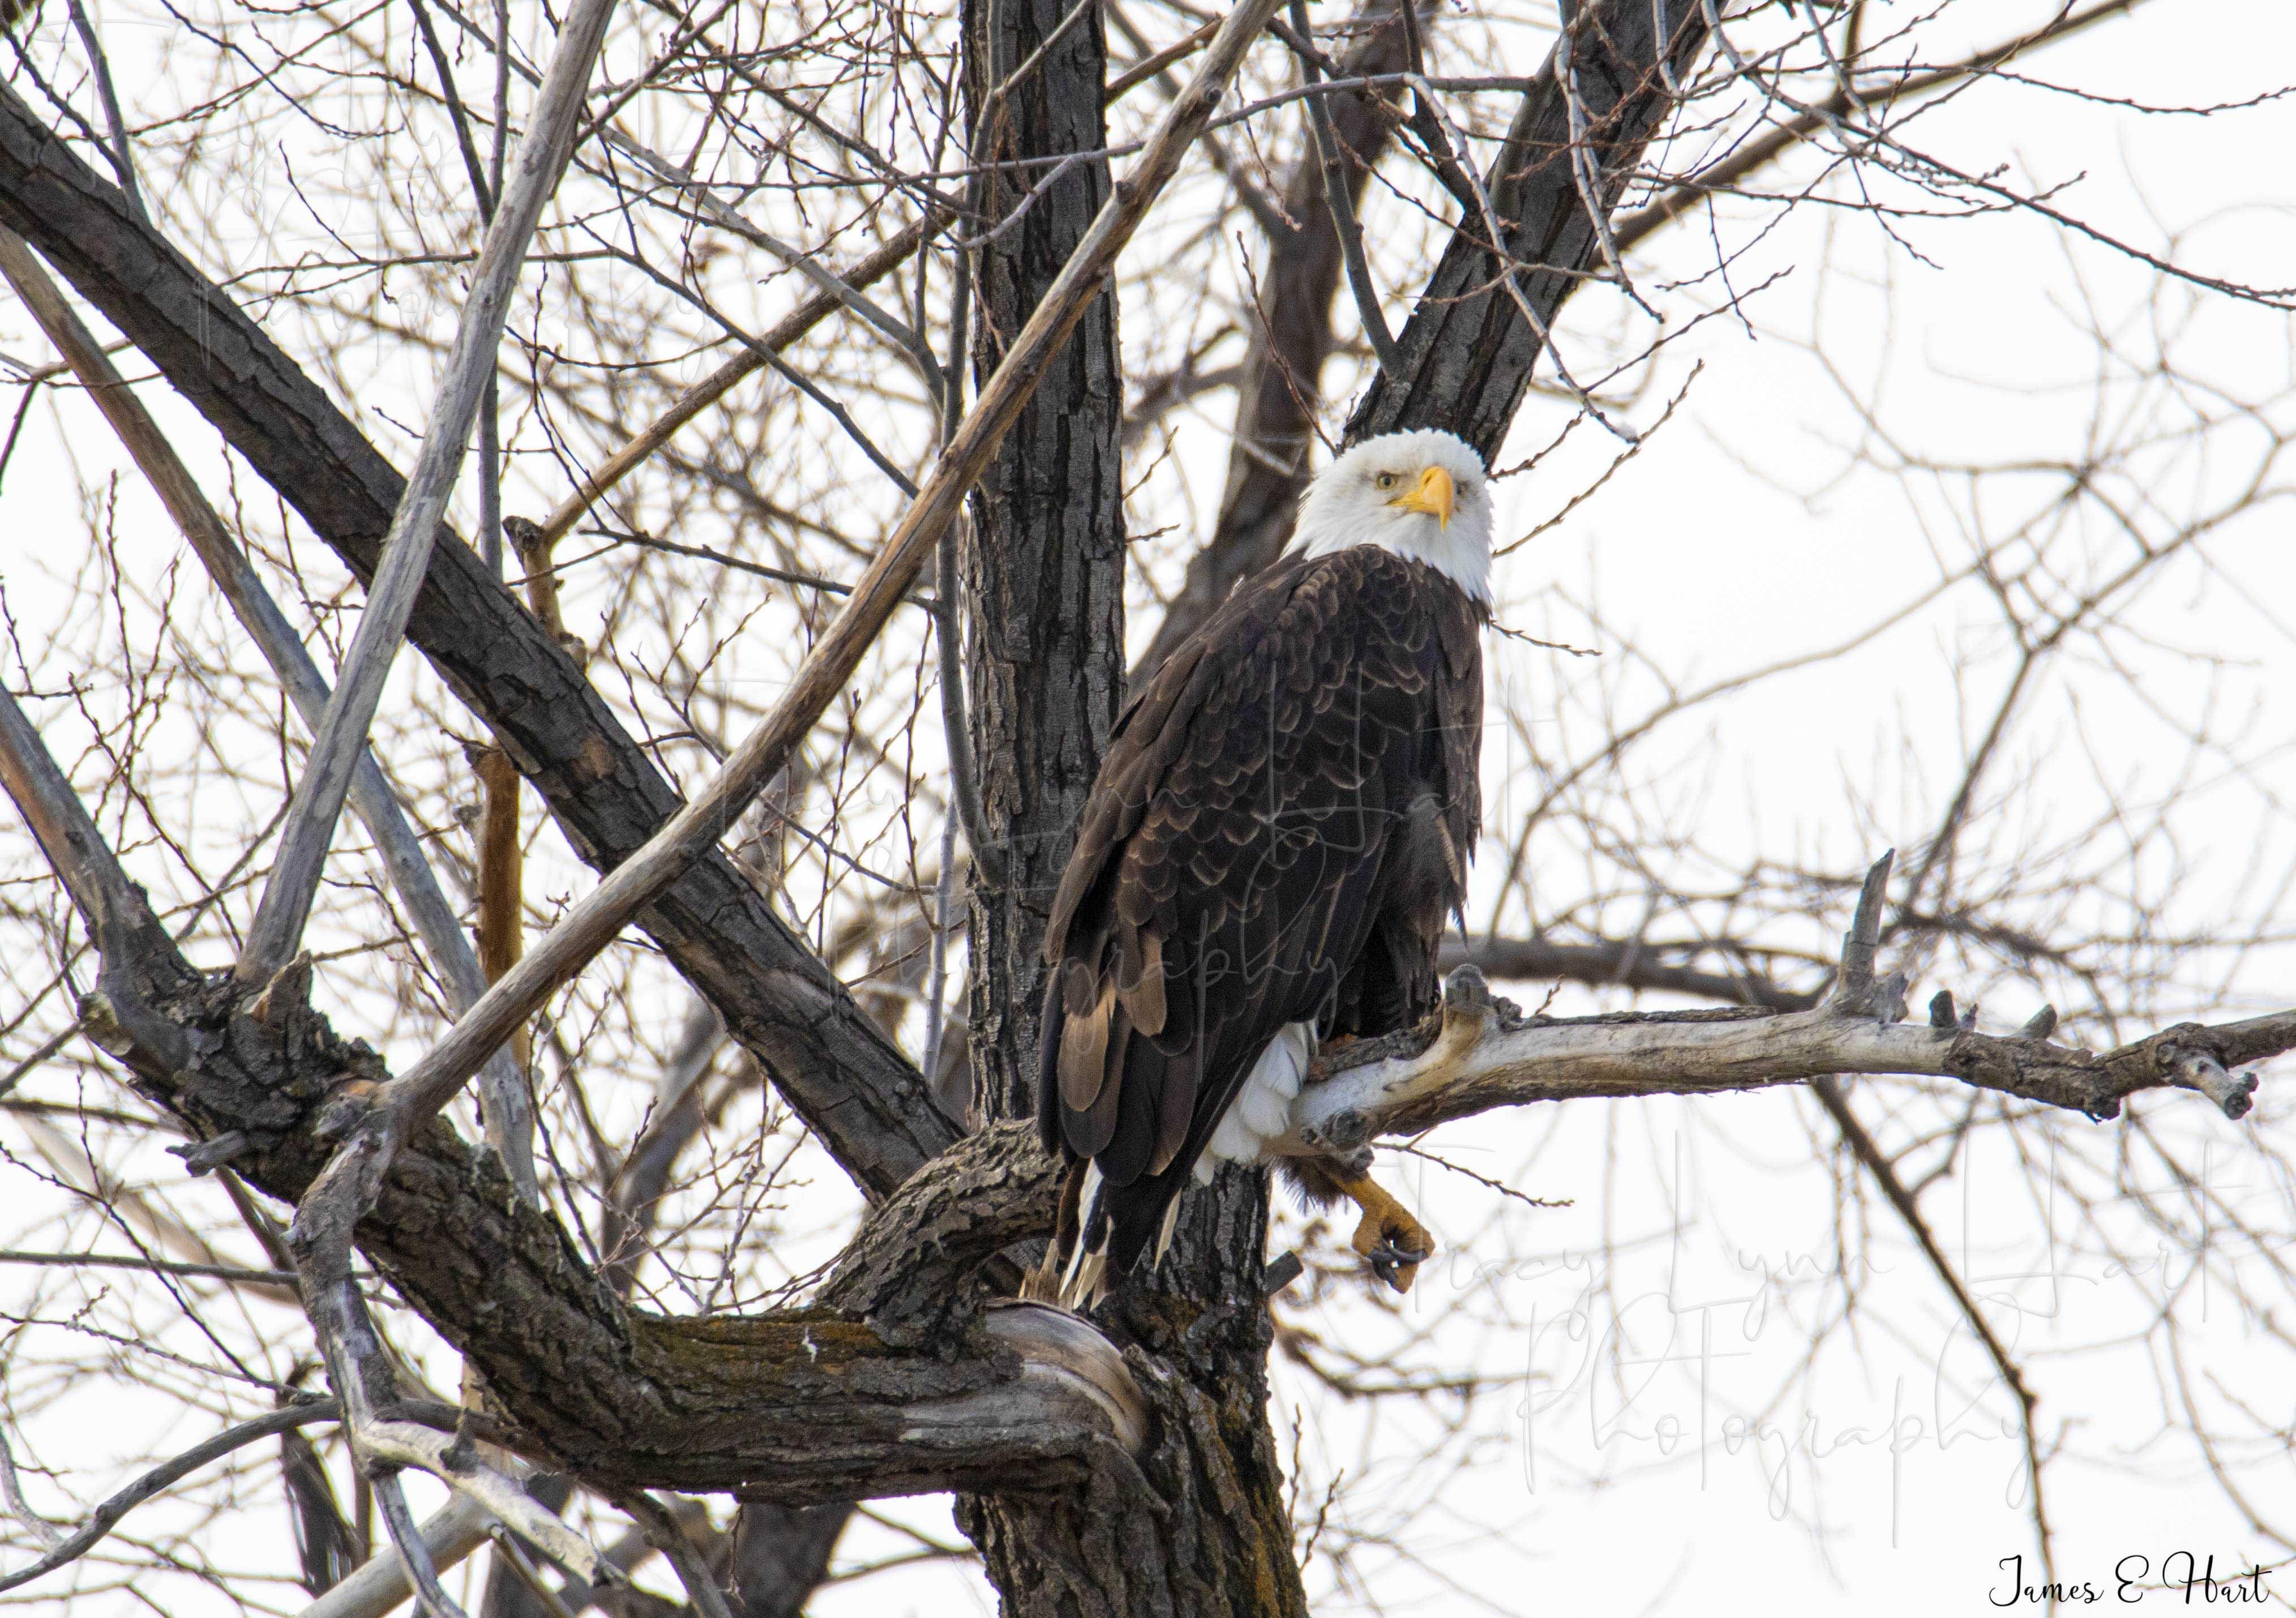 Eagle James E